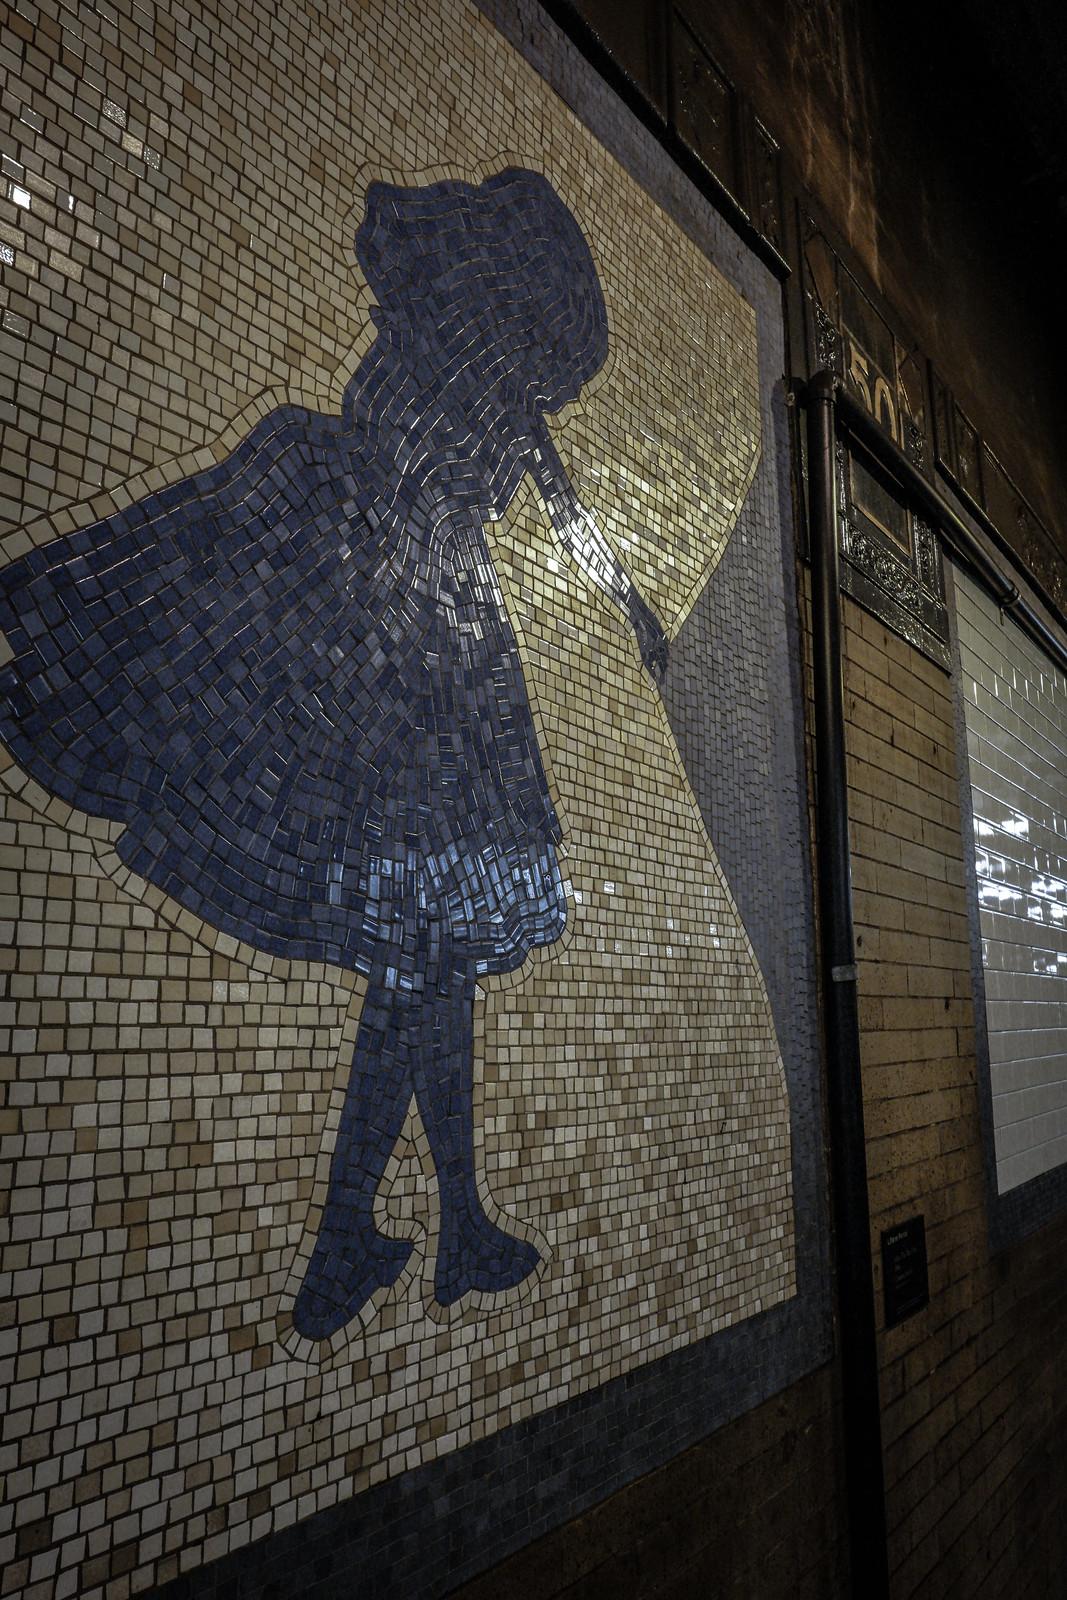 Alice in the Subways